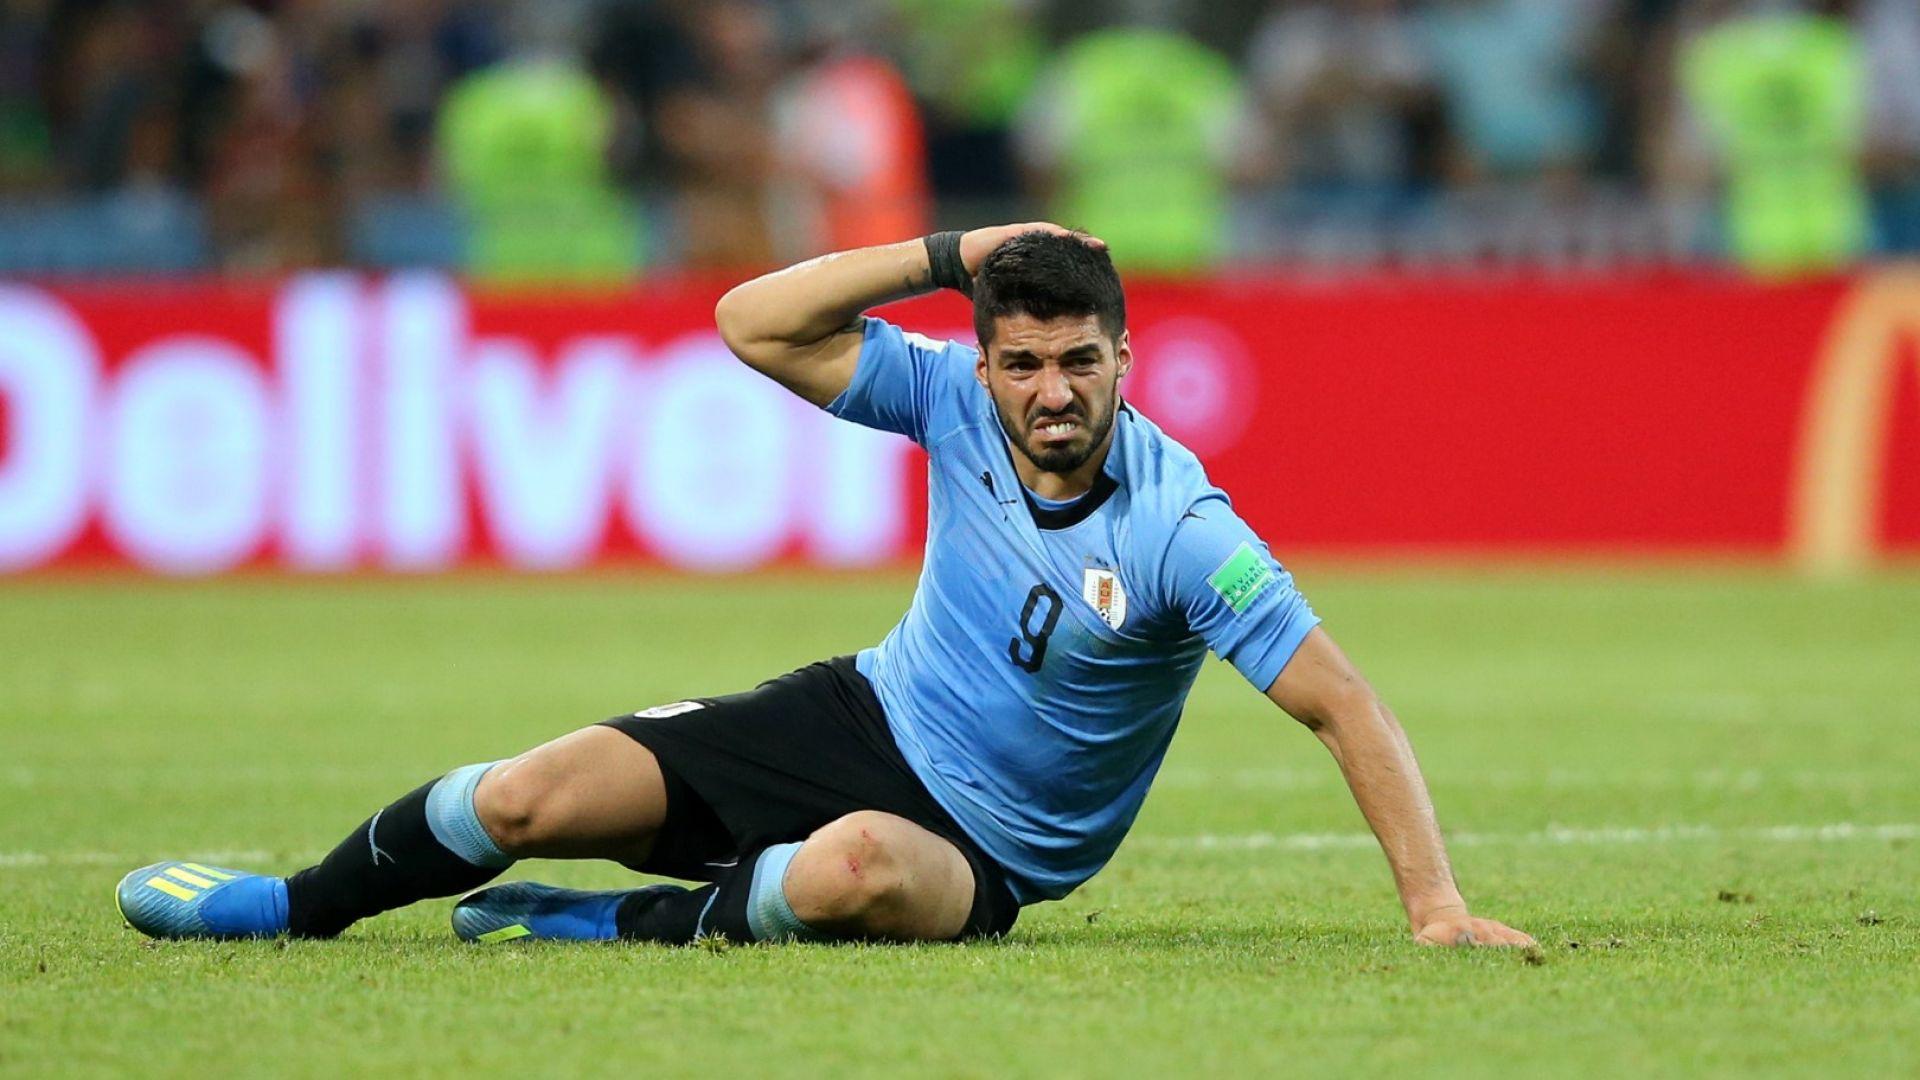 Нови проблеми за Уругвай, Суарес се контузи